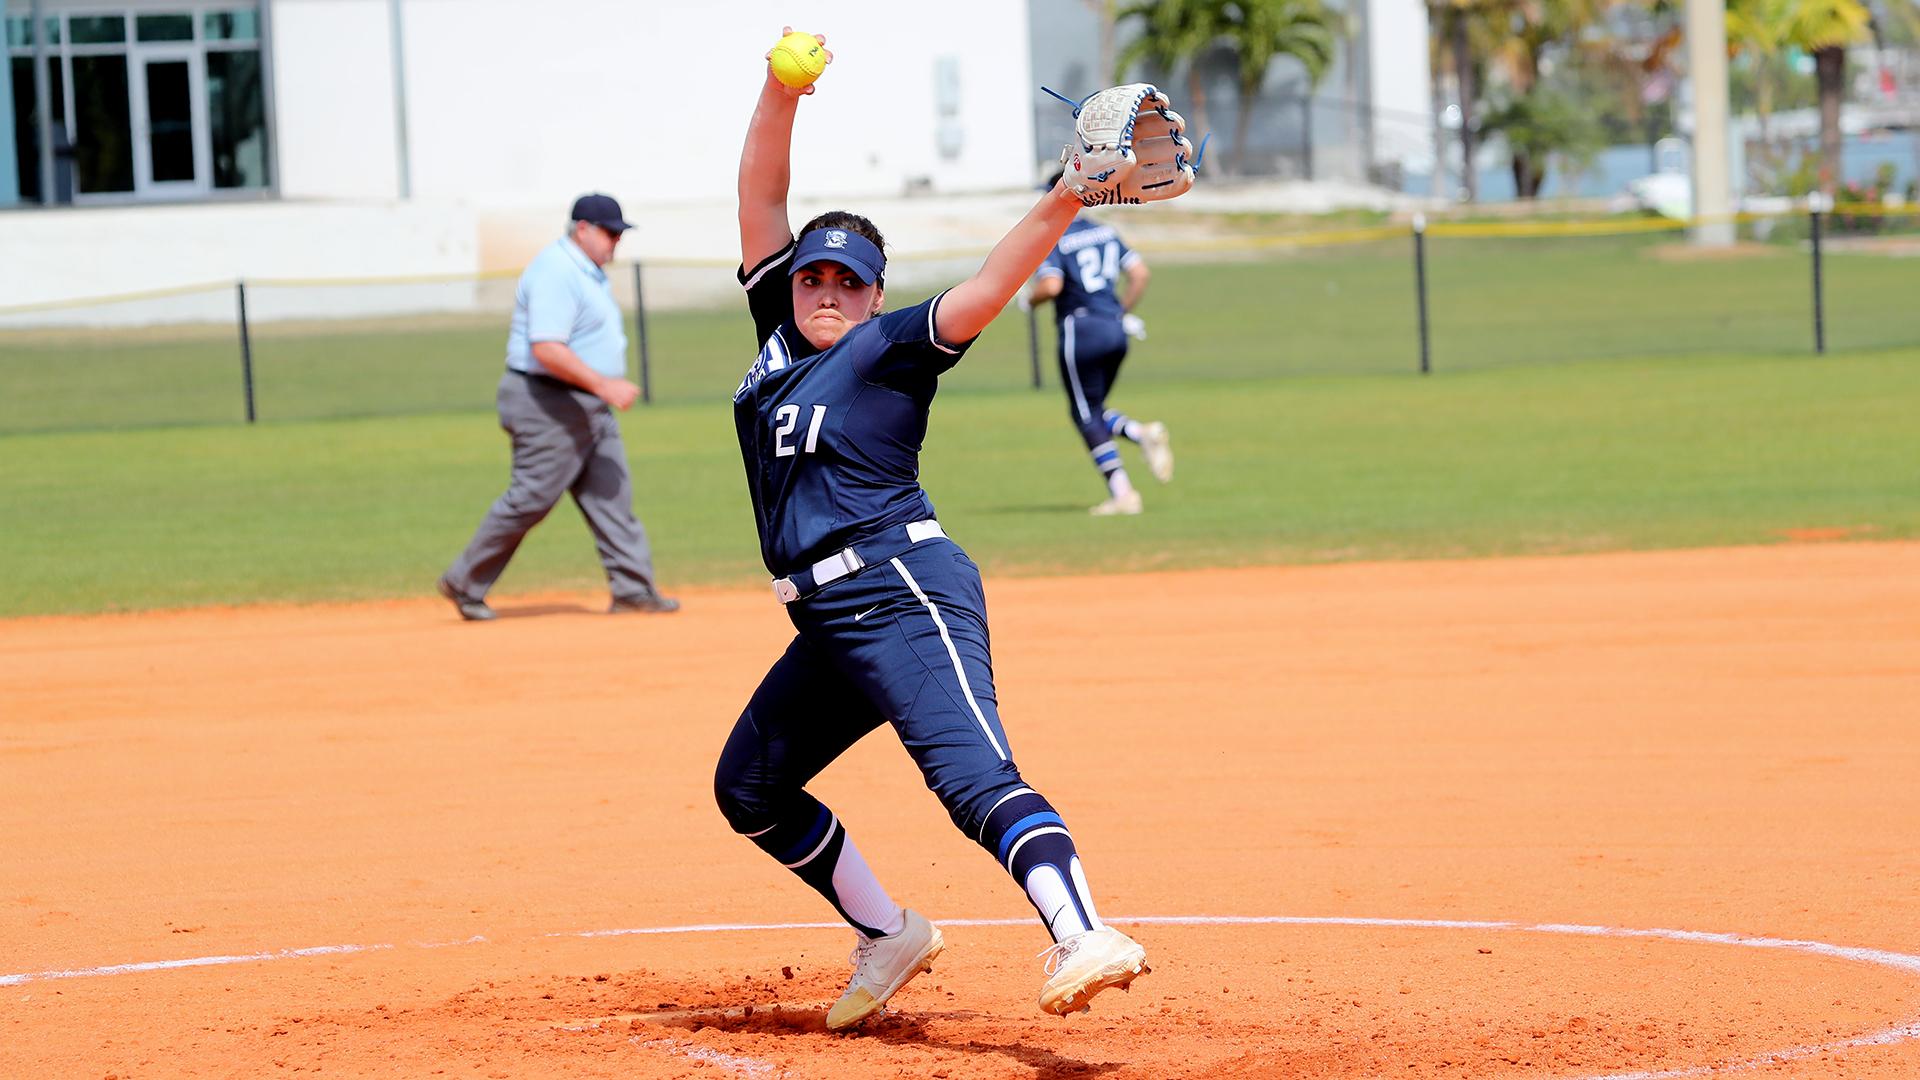 Mikayla Santa Cruz – 2020 – Softball – Creighton Throughout Del Oro High School Calendar 2020